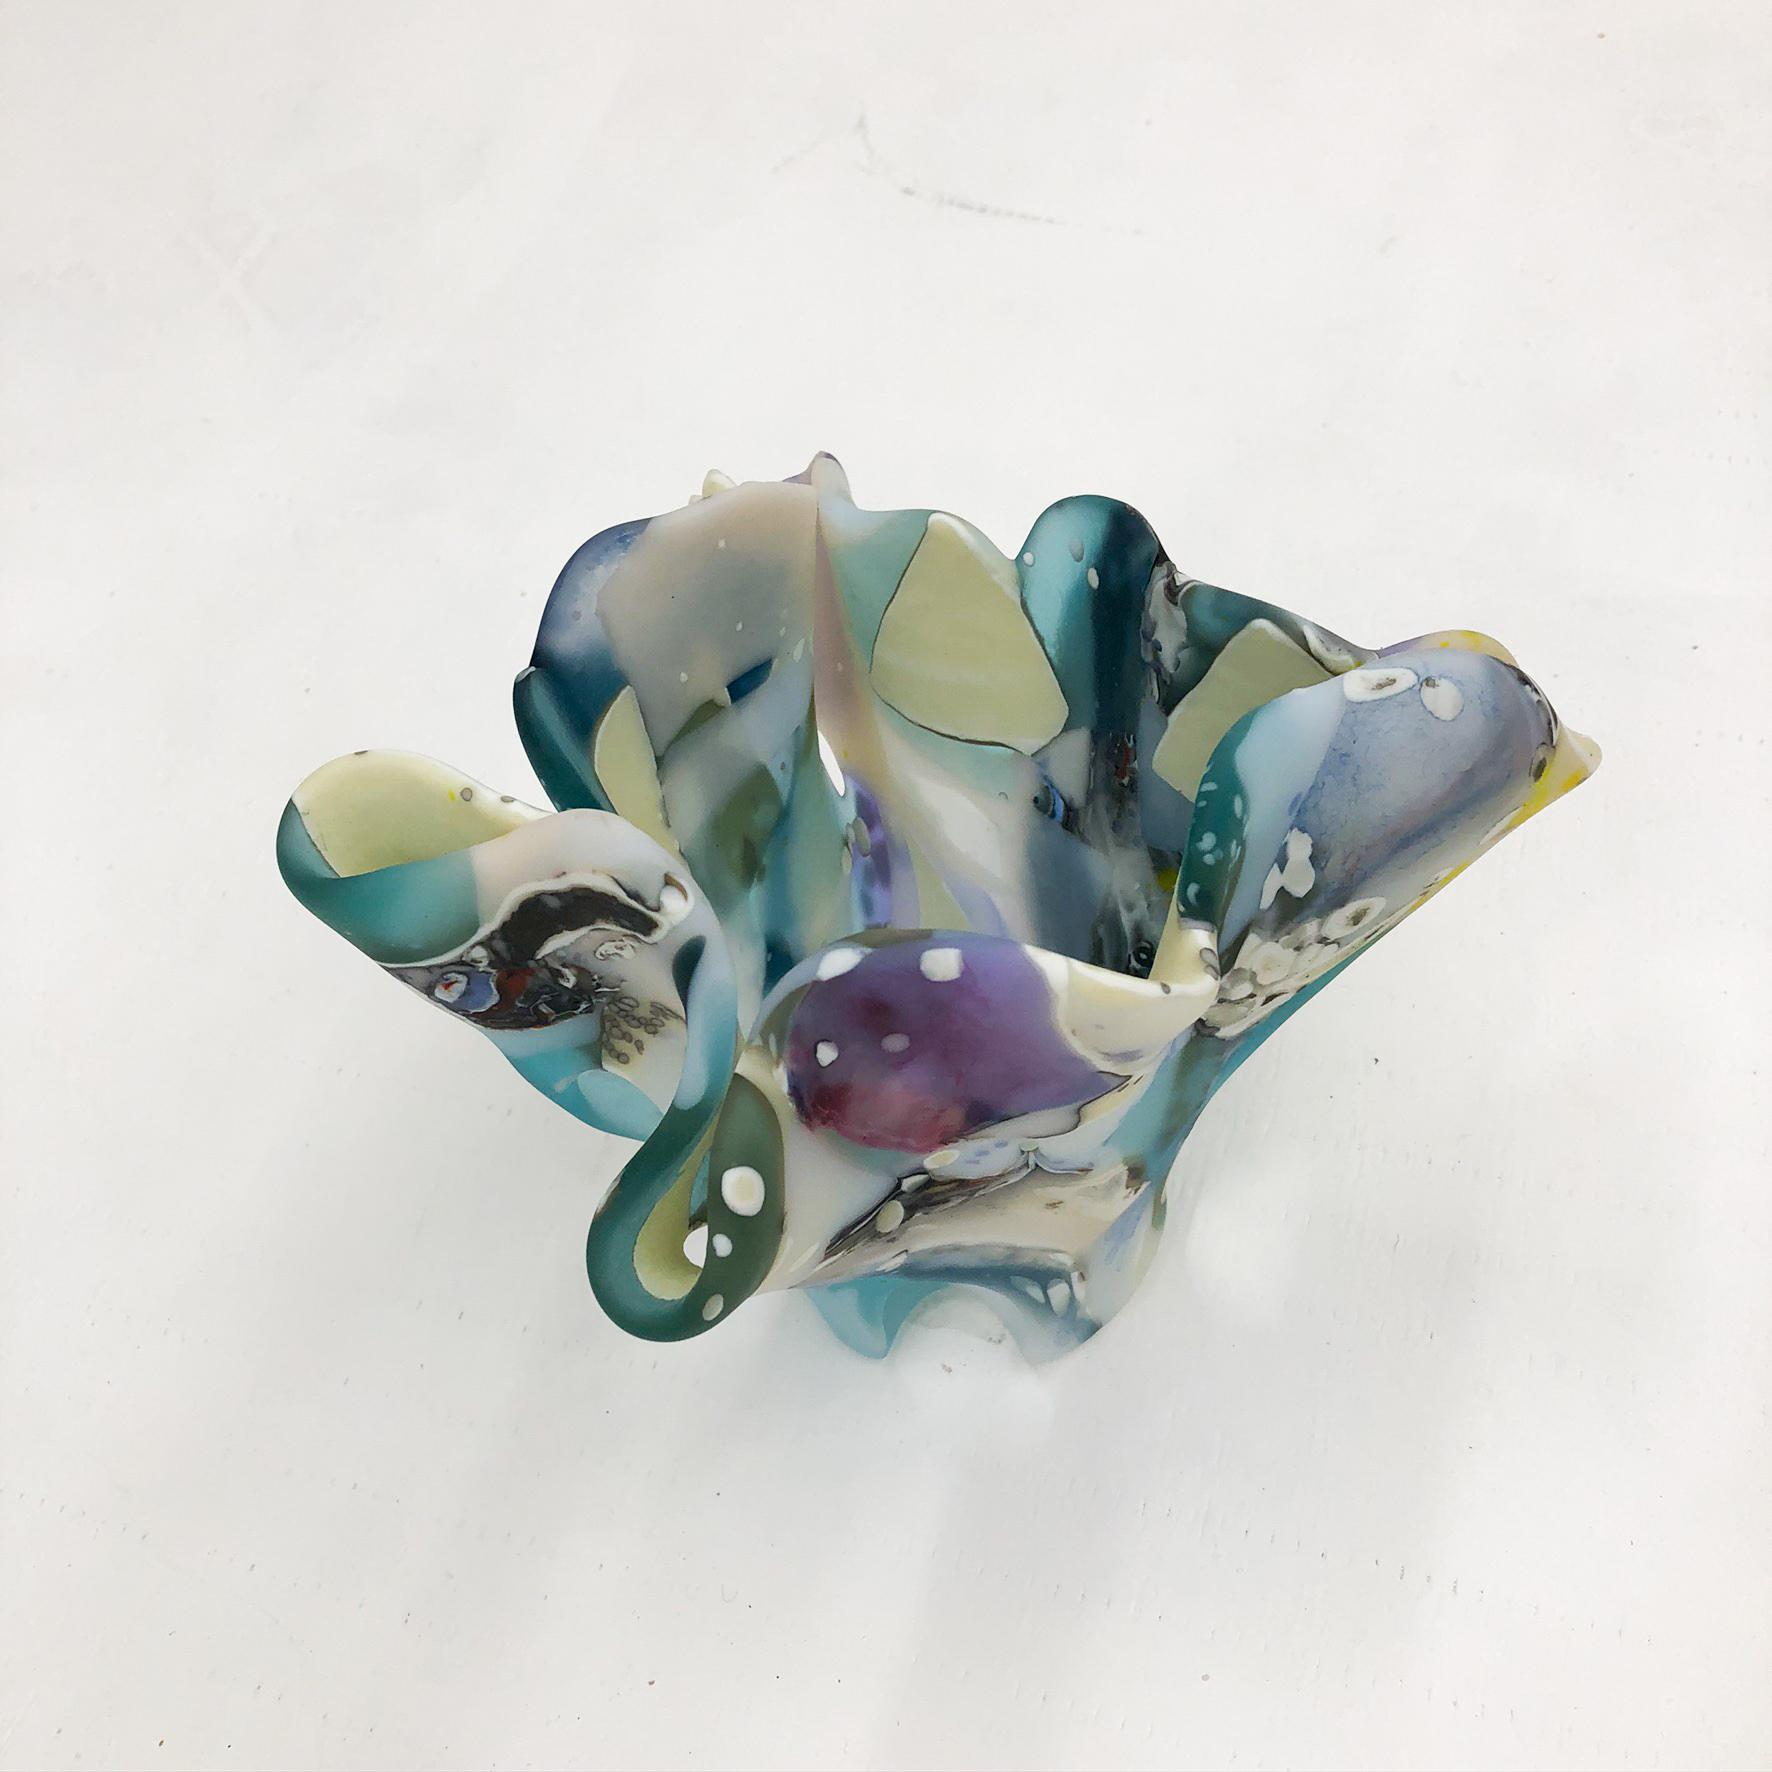 Handmade Sea Glass Vase Sculpture